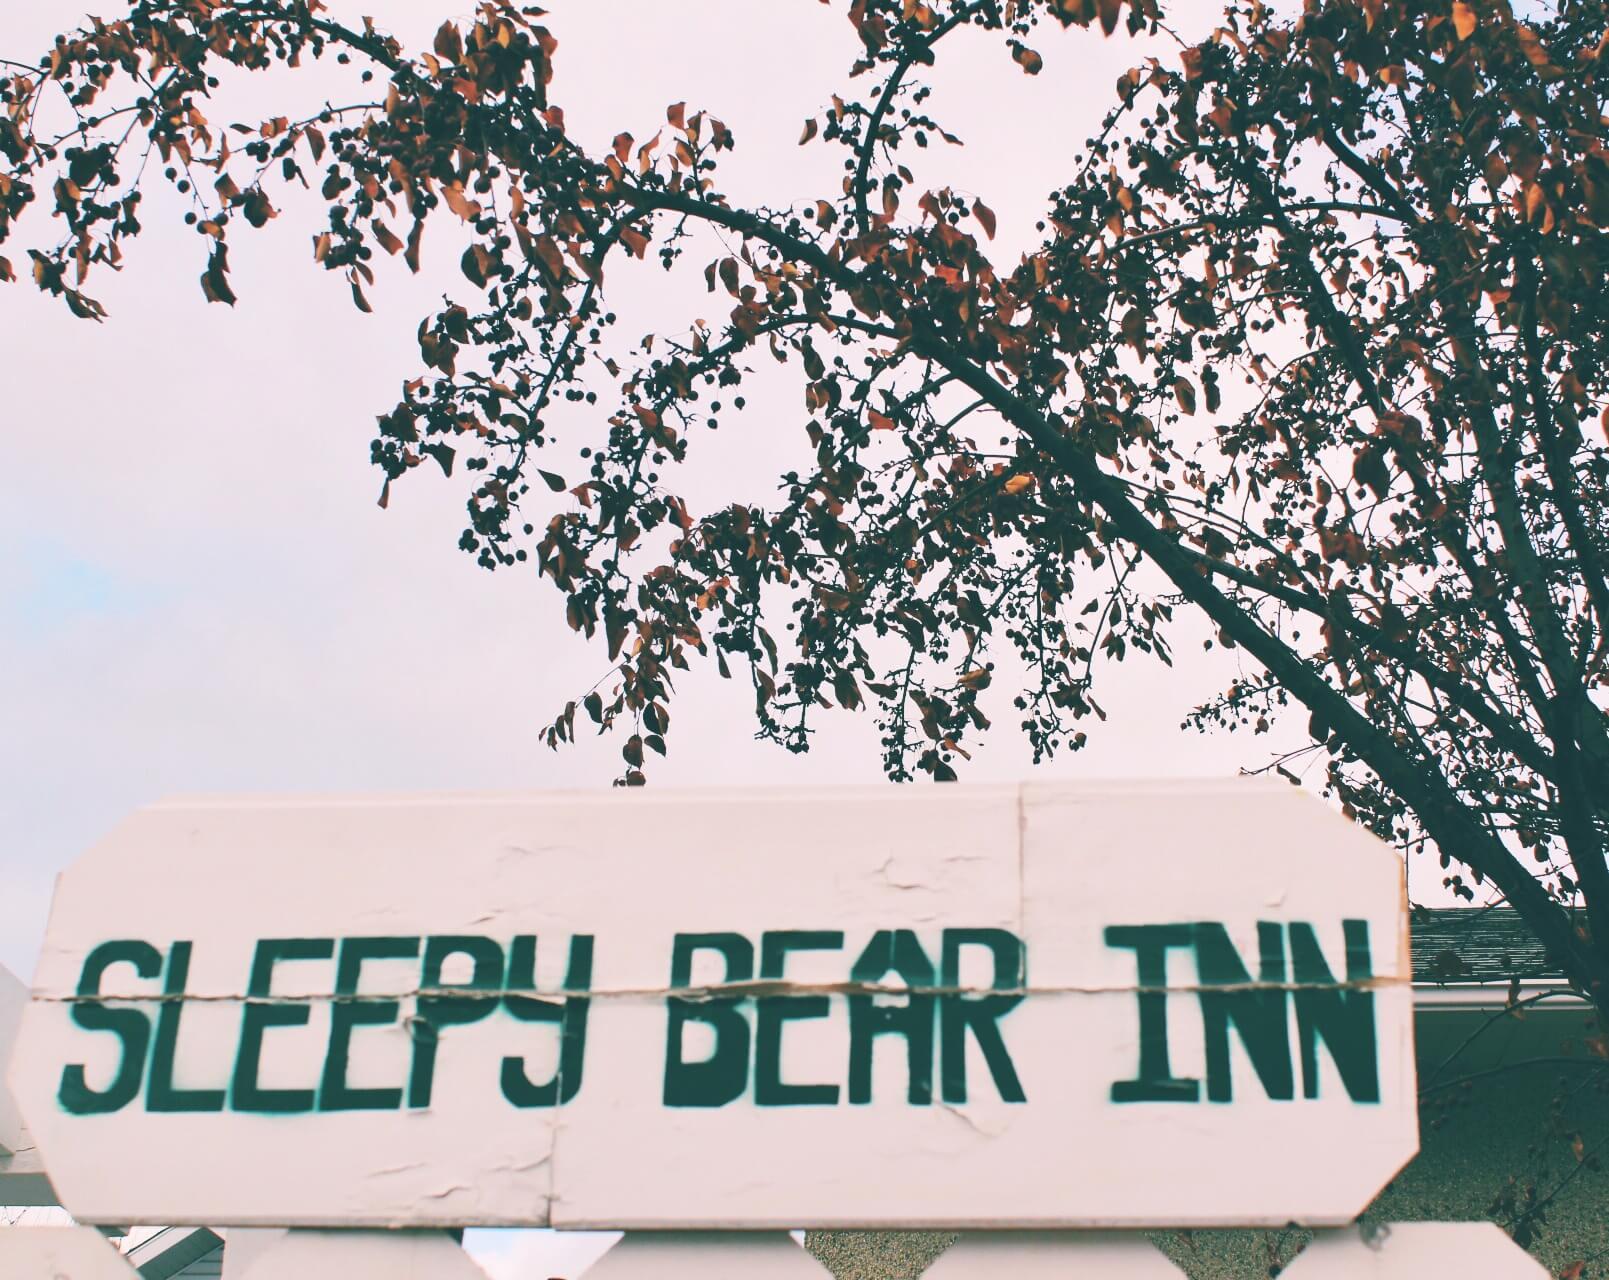 jasper-sleepy-bear-inn